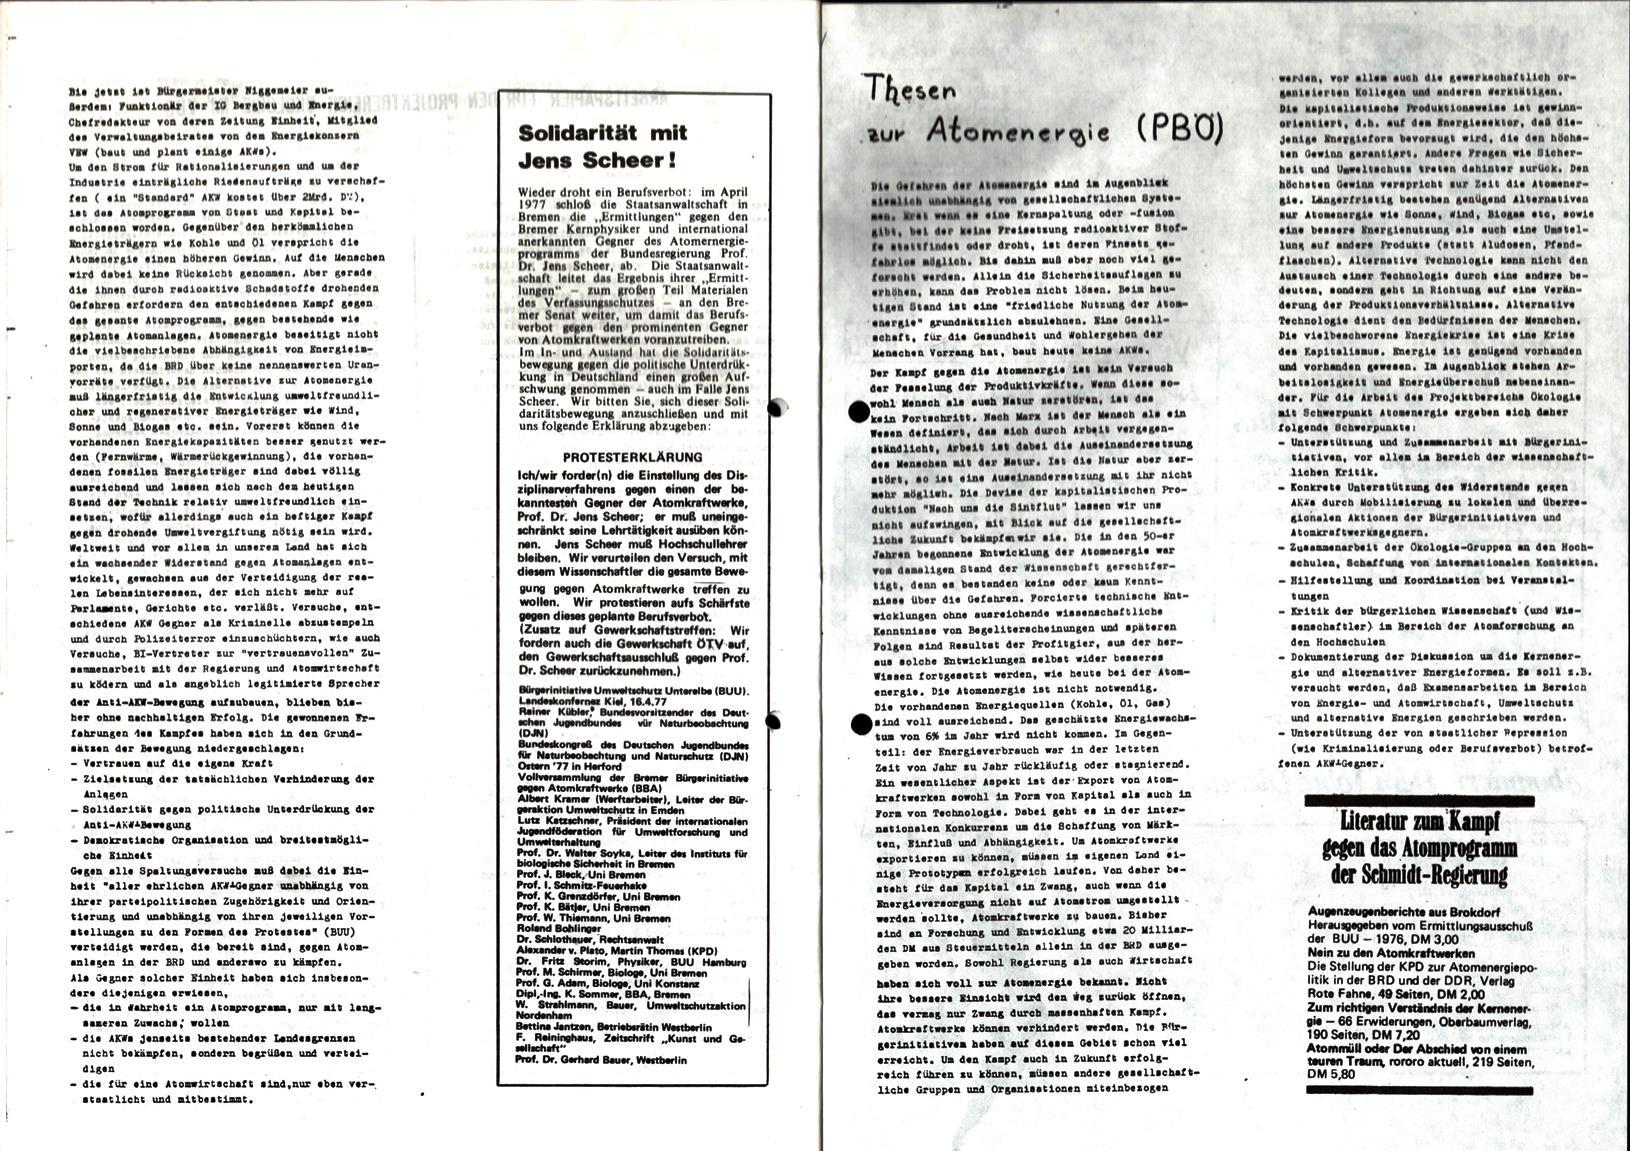 Dortmund_KSV_Studentenpresse_Uni_1977_05_17_006